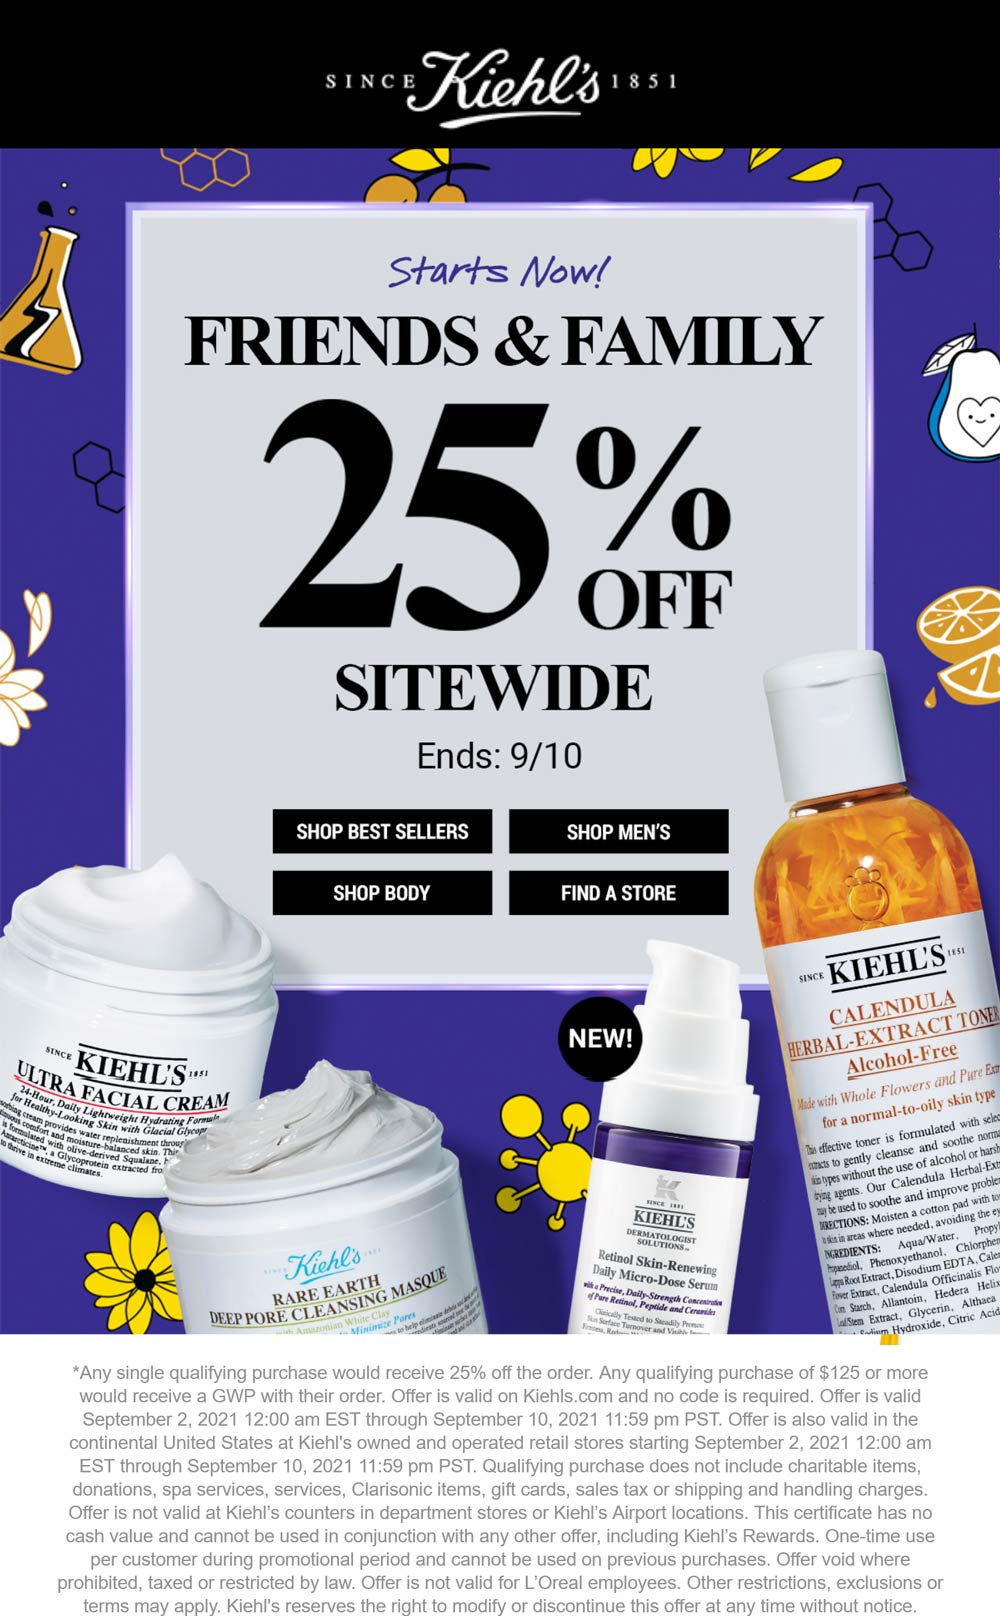 Kiehls stores Coupon  25% off at Kiehls #kiehls